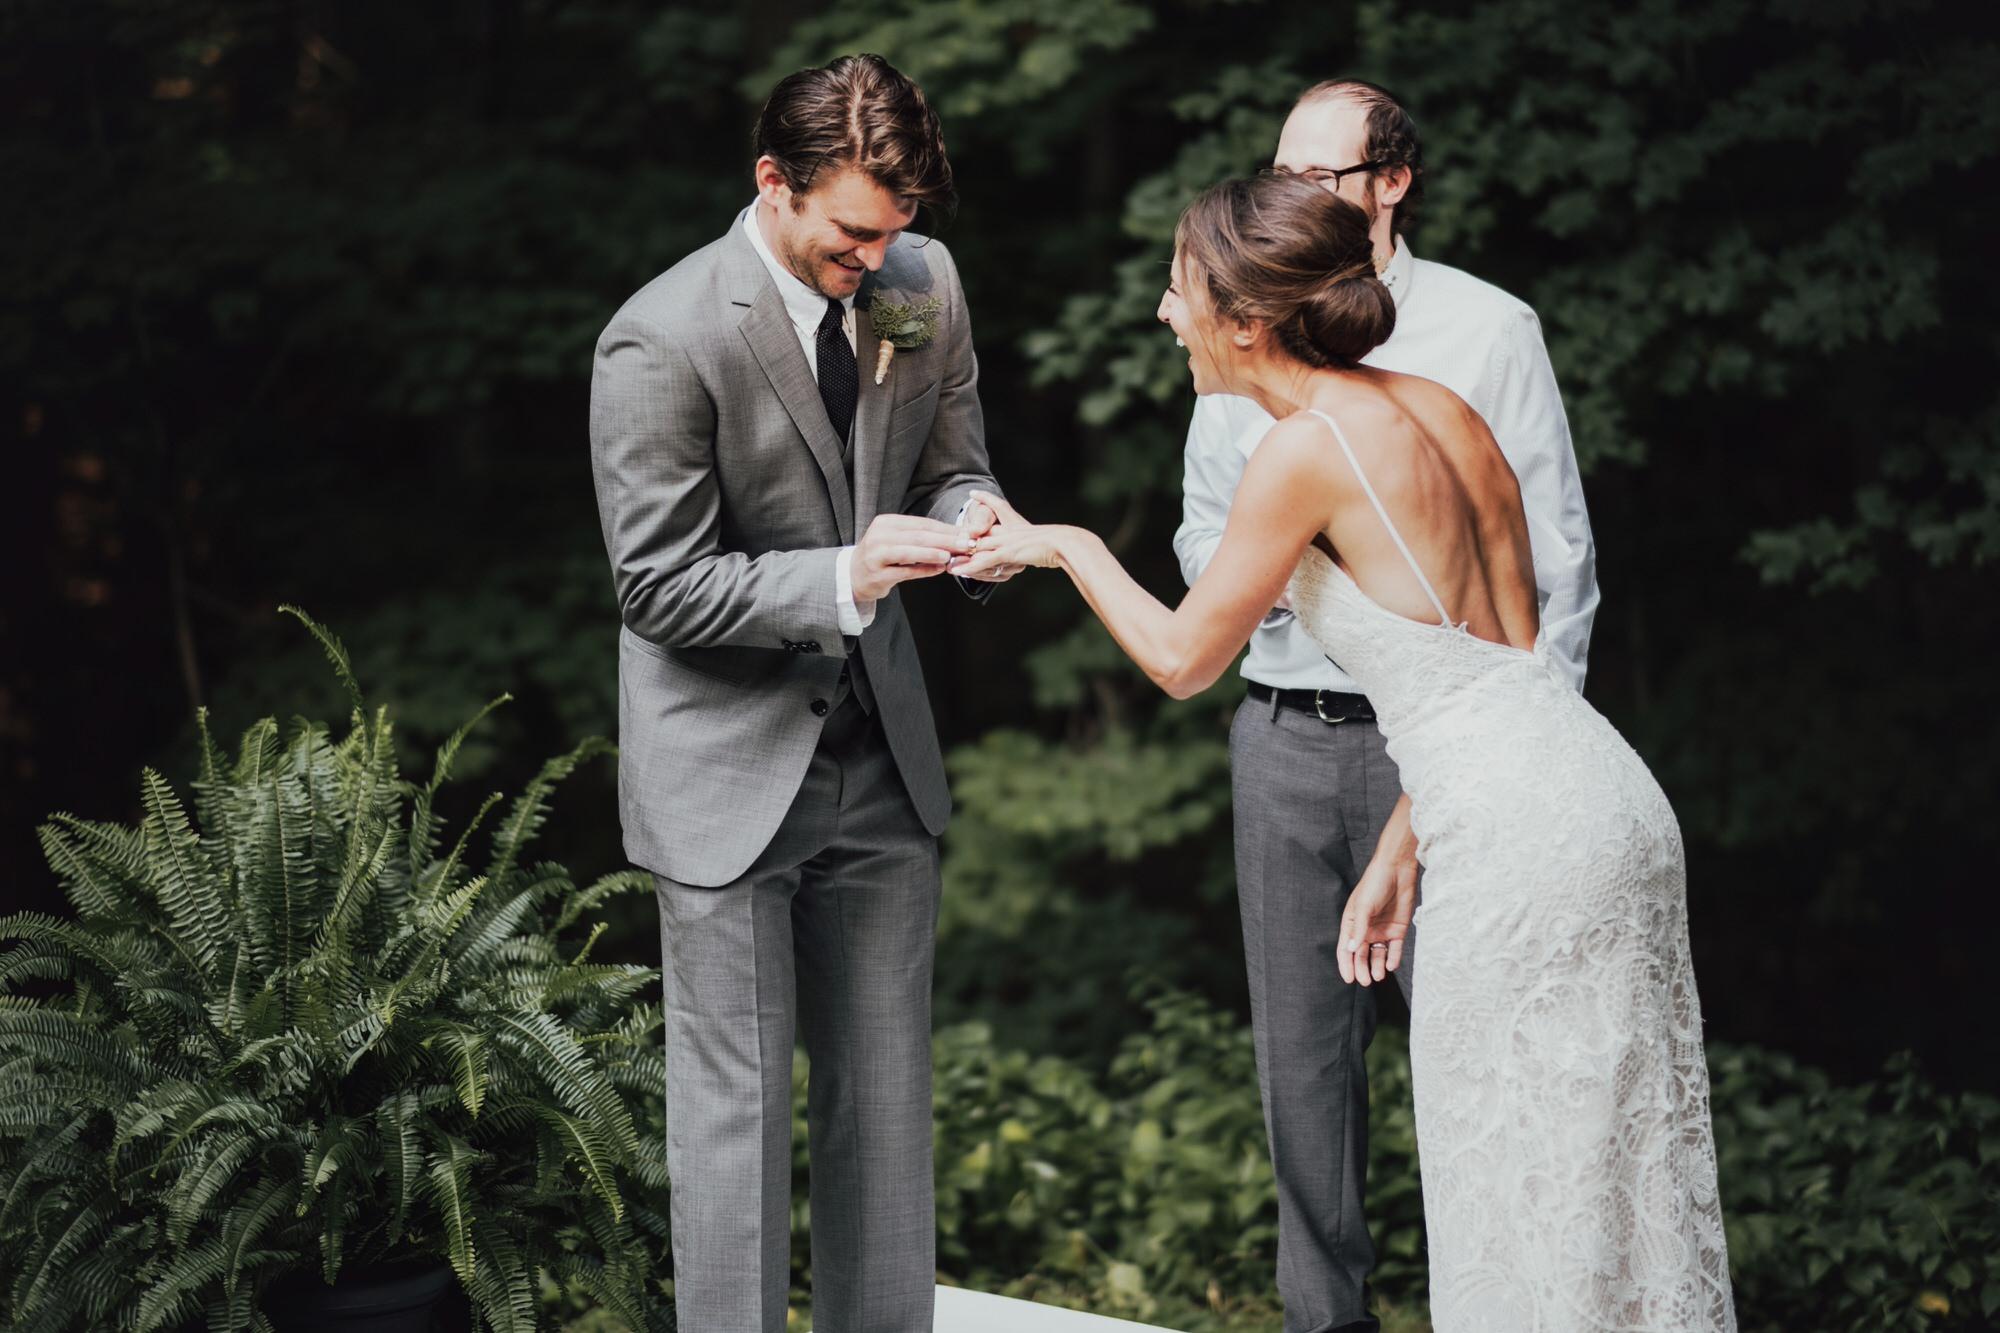 emily-aaron-rochester-new-york-wedding-photographer-155.JPG